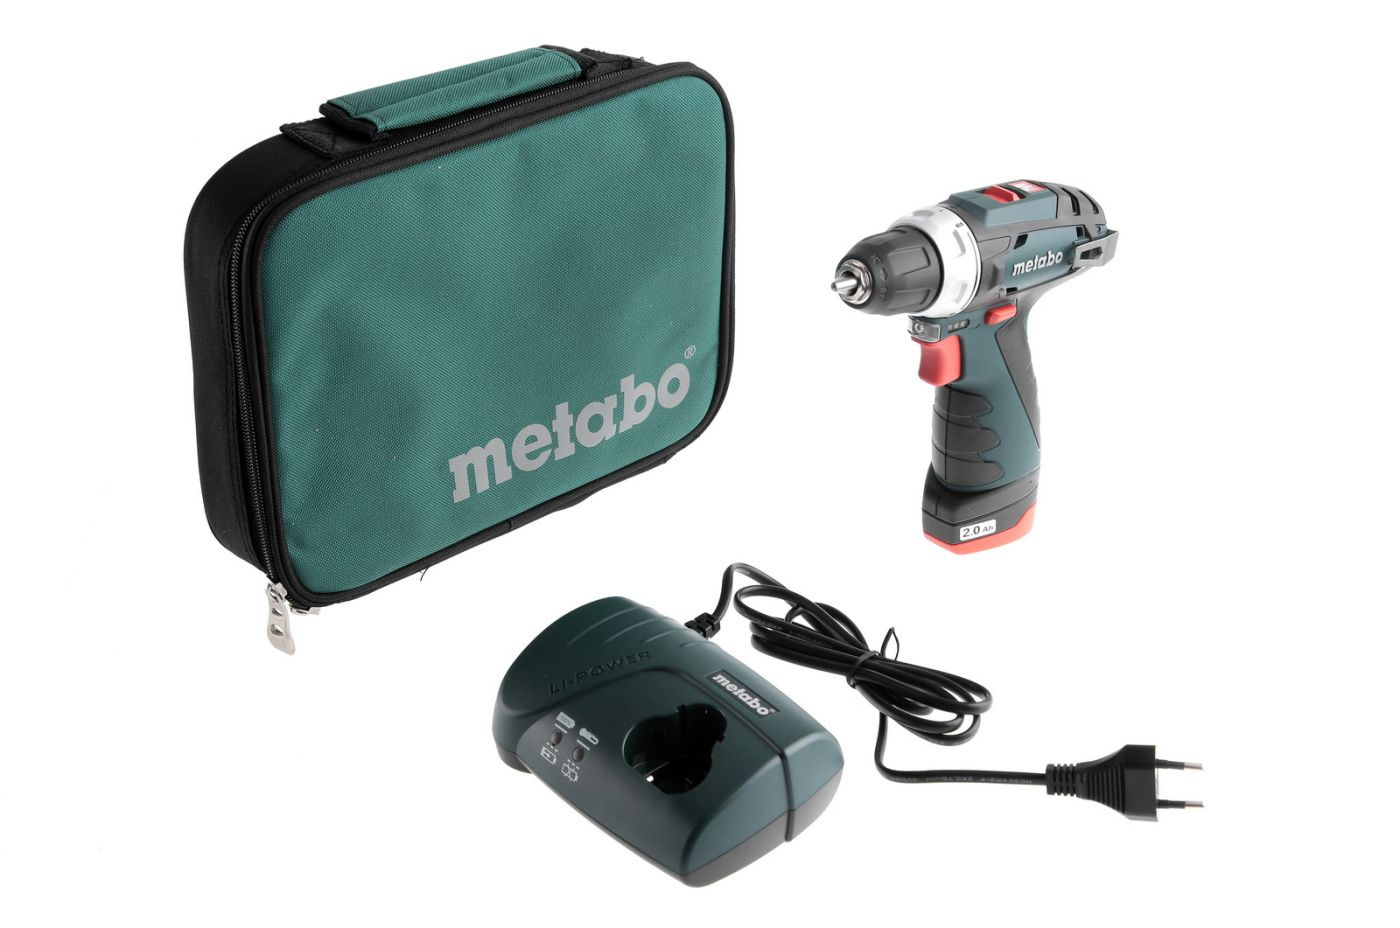 Дрель-шуруповерт Metabo PowerMaxx BS 2.0Ah x1 Bag (600079500)